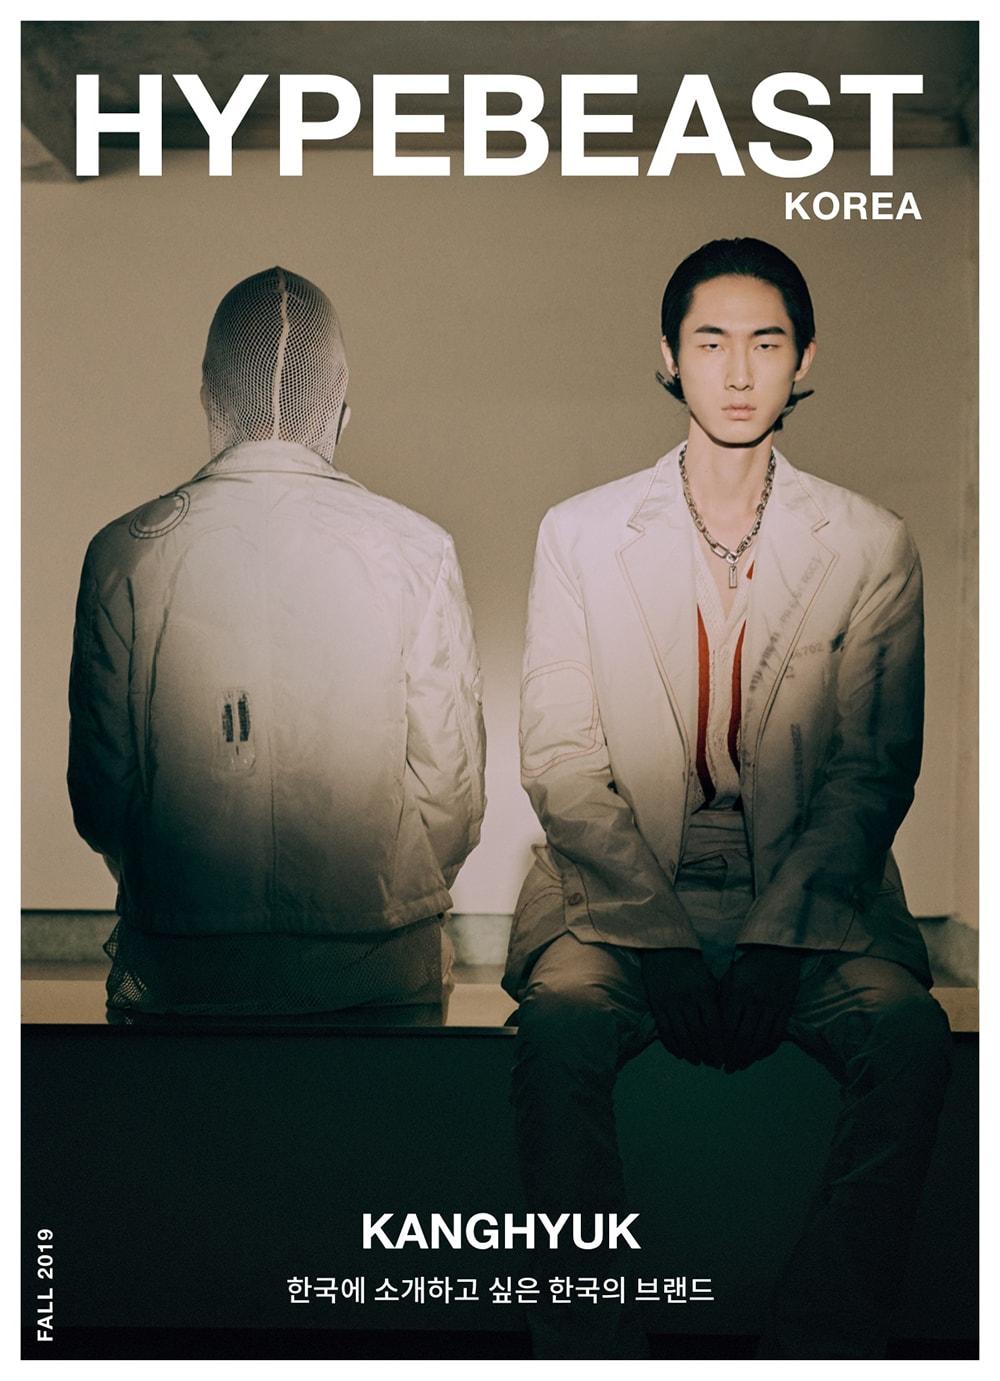 Kanghyuk korea south seoul lvmh prize designer dover street market Kanghyuk Choi Sanglak Shon digital cover